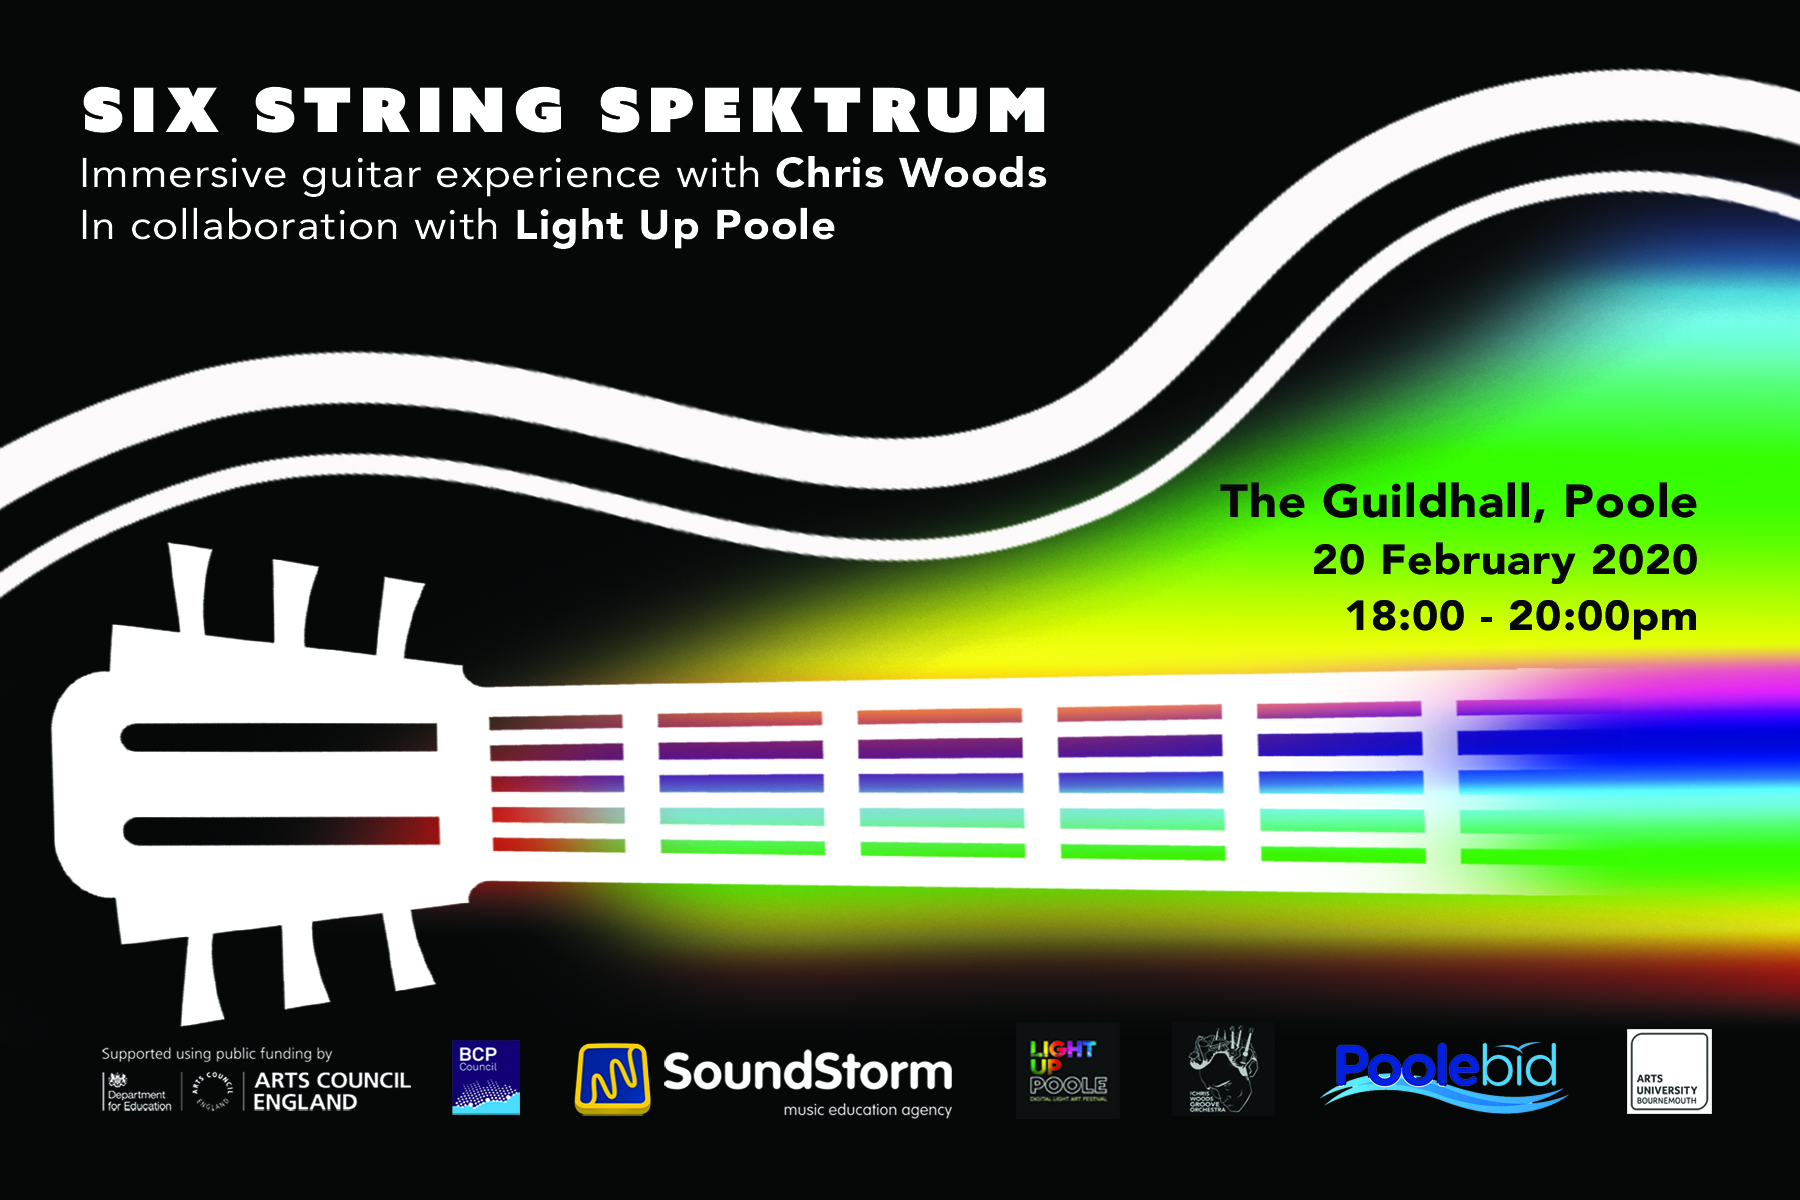 6156Six String Spektrum at Light Up Poole – Application